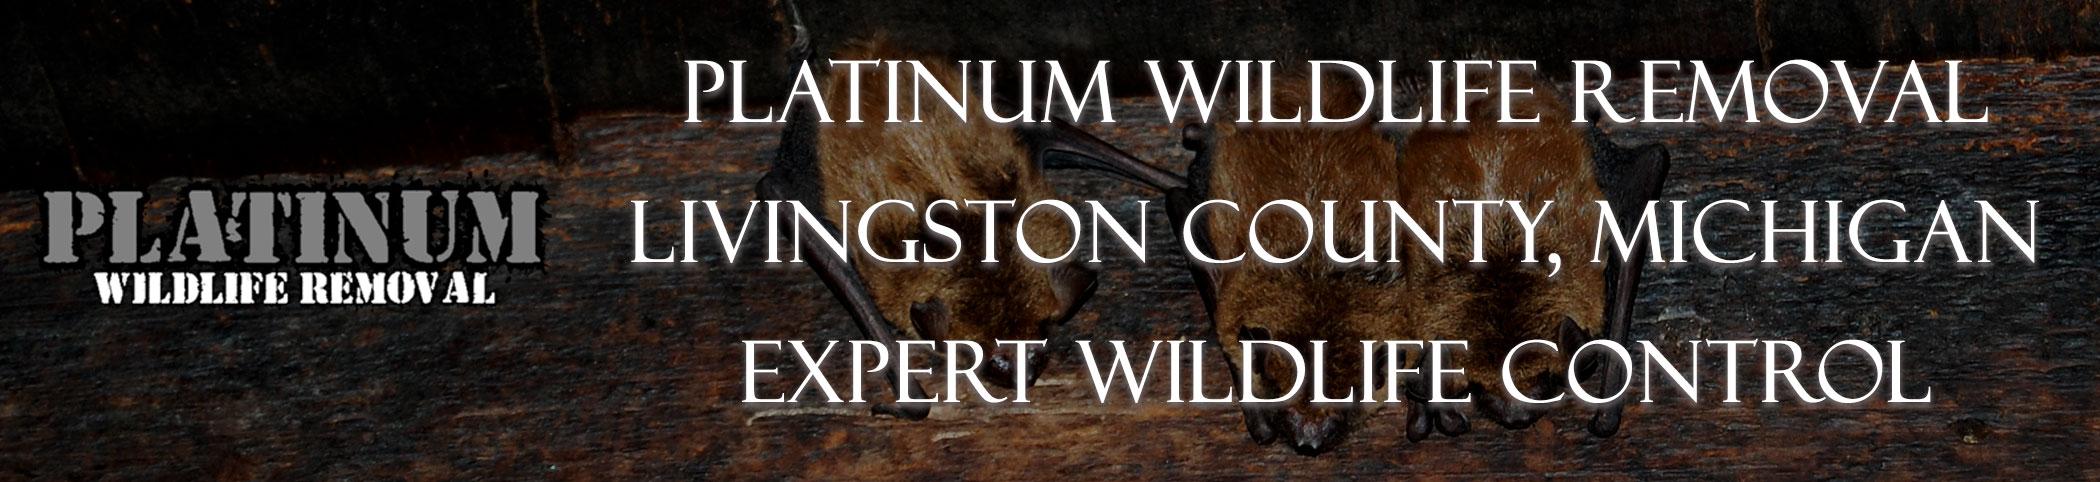 Livingston-County-Michigan-Bat-Removal-Header-Image